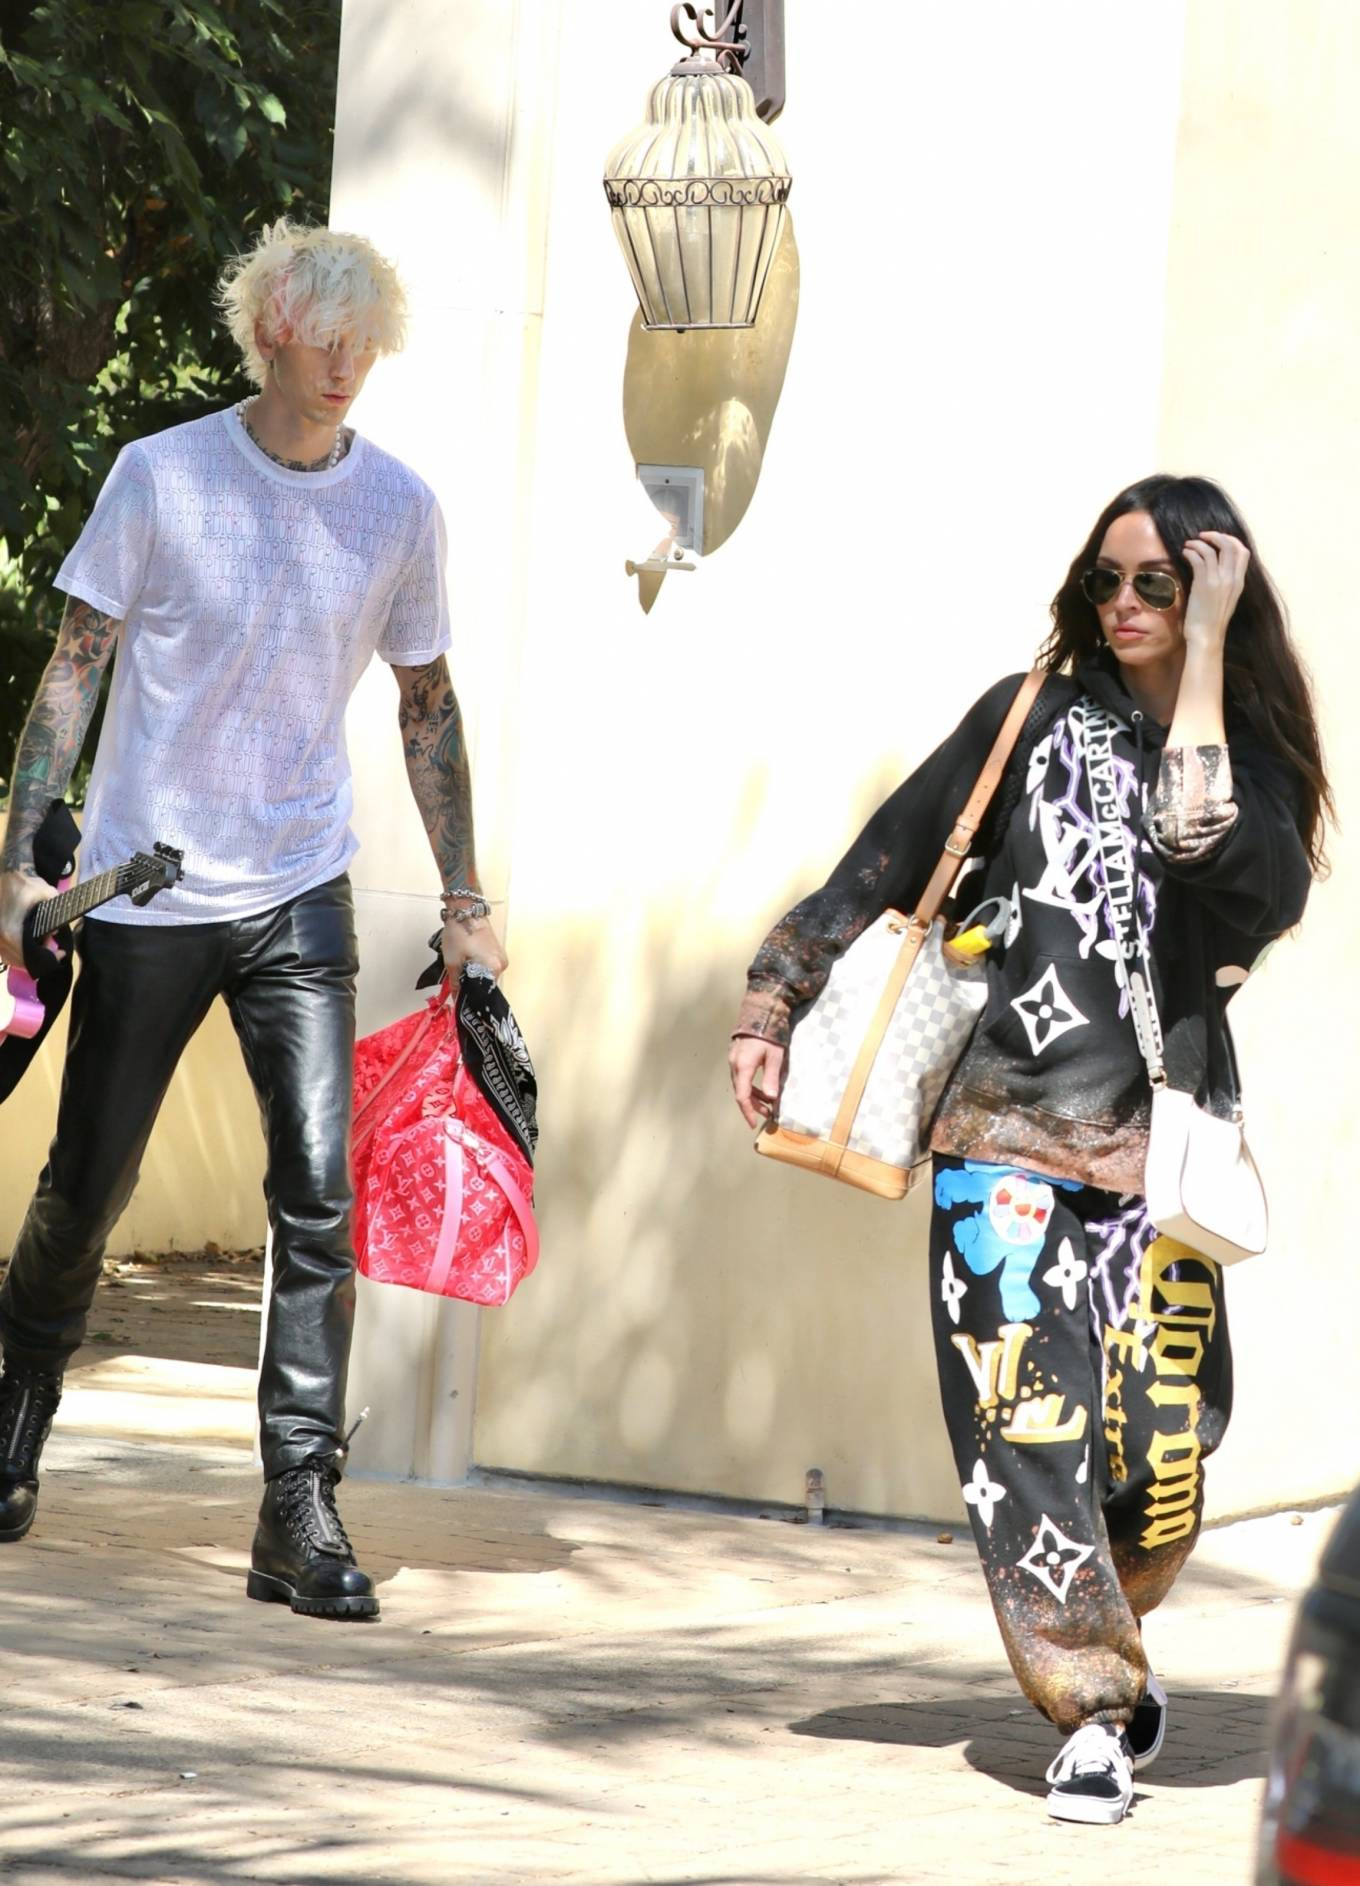 Megan Fox and Machine Gun Kelly leaving a house in Los Angeles